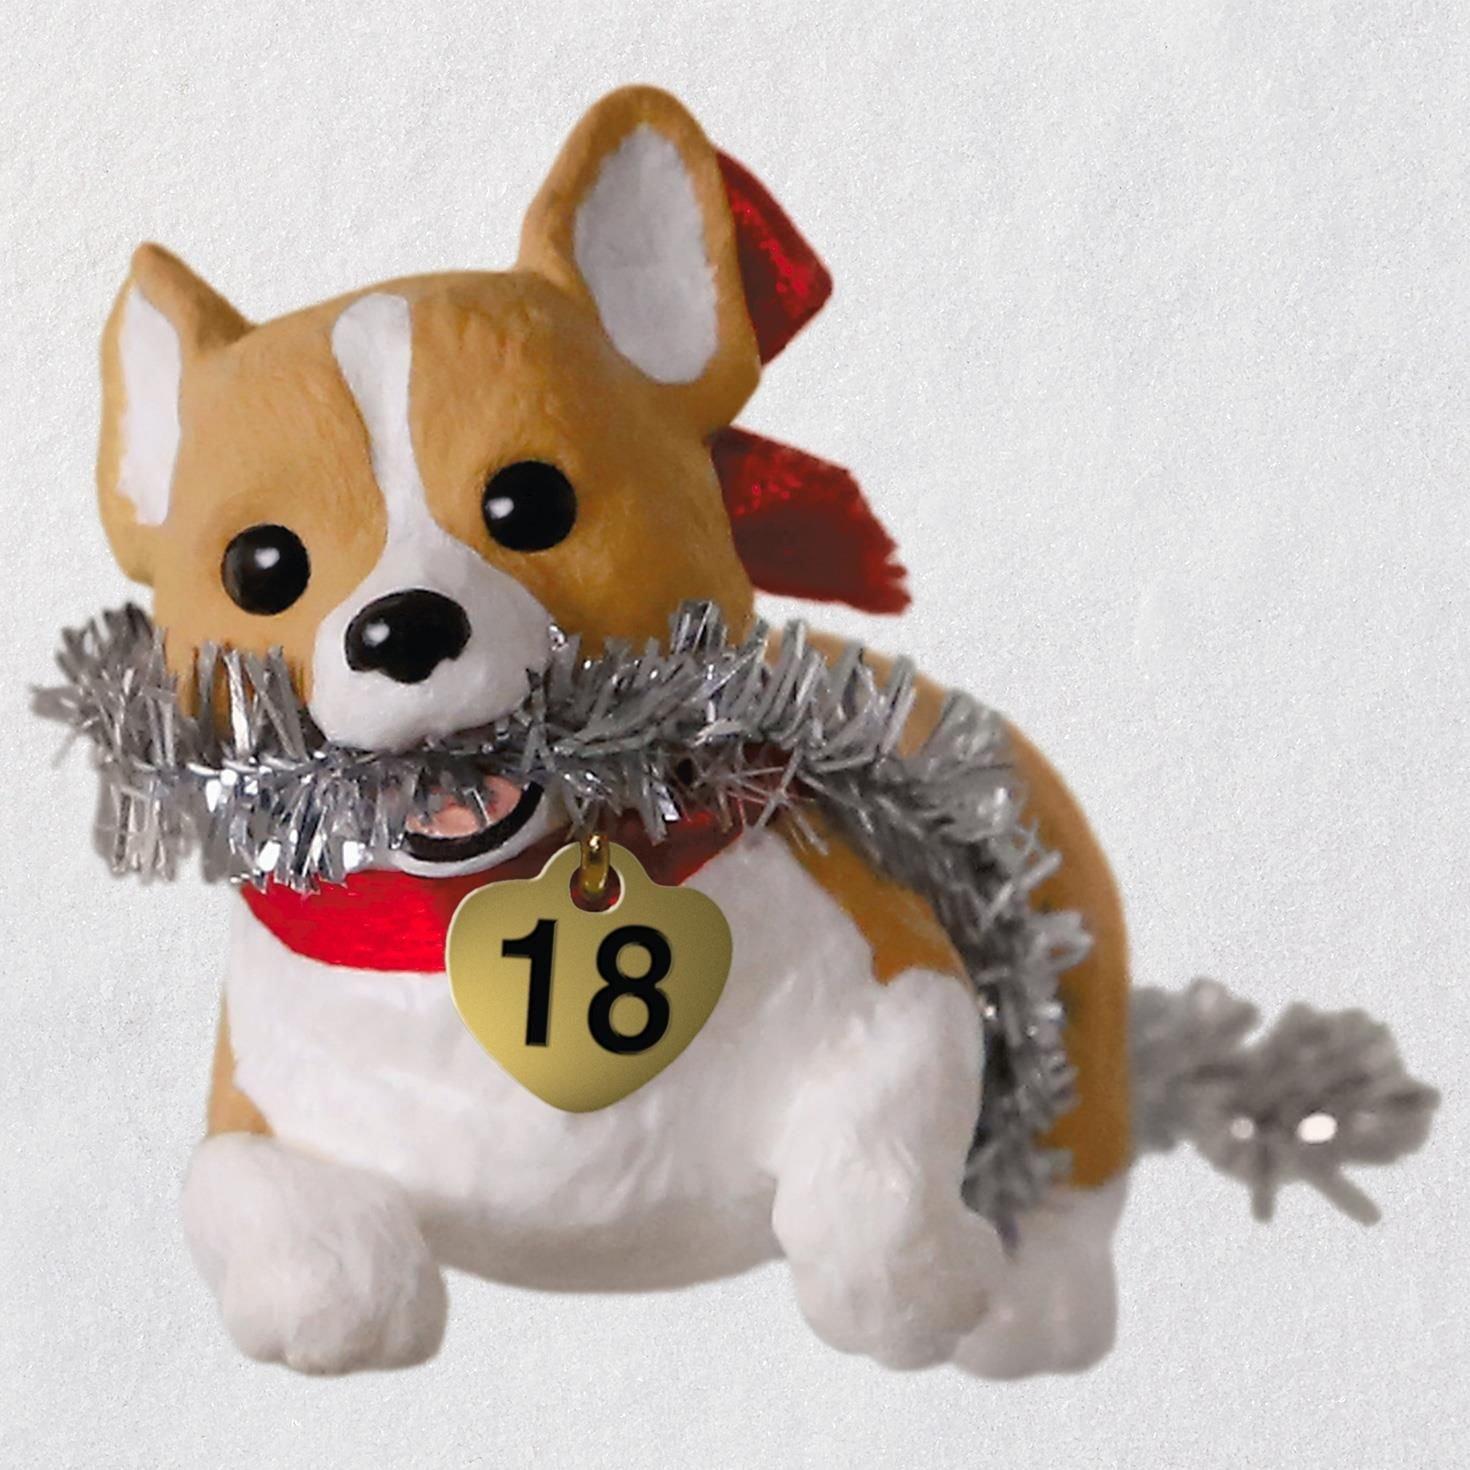 Hallmark Keepsake Christmas Ornament 2018 Year Dated, Puppy Love Welsh Corgi